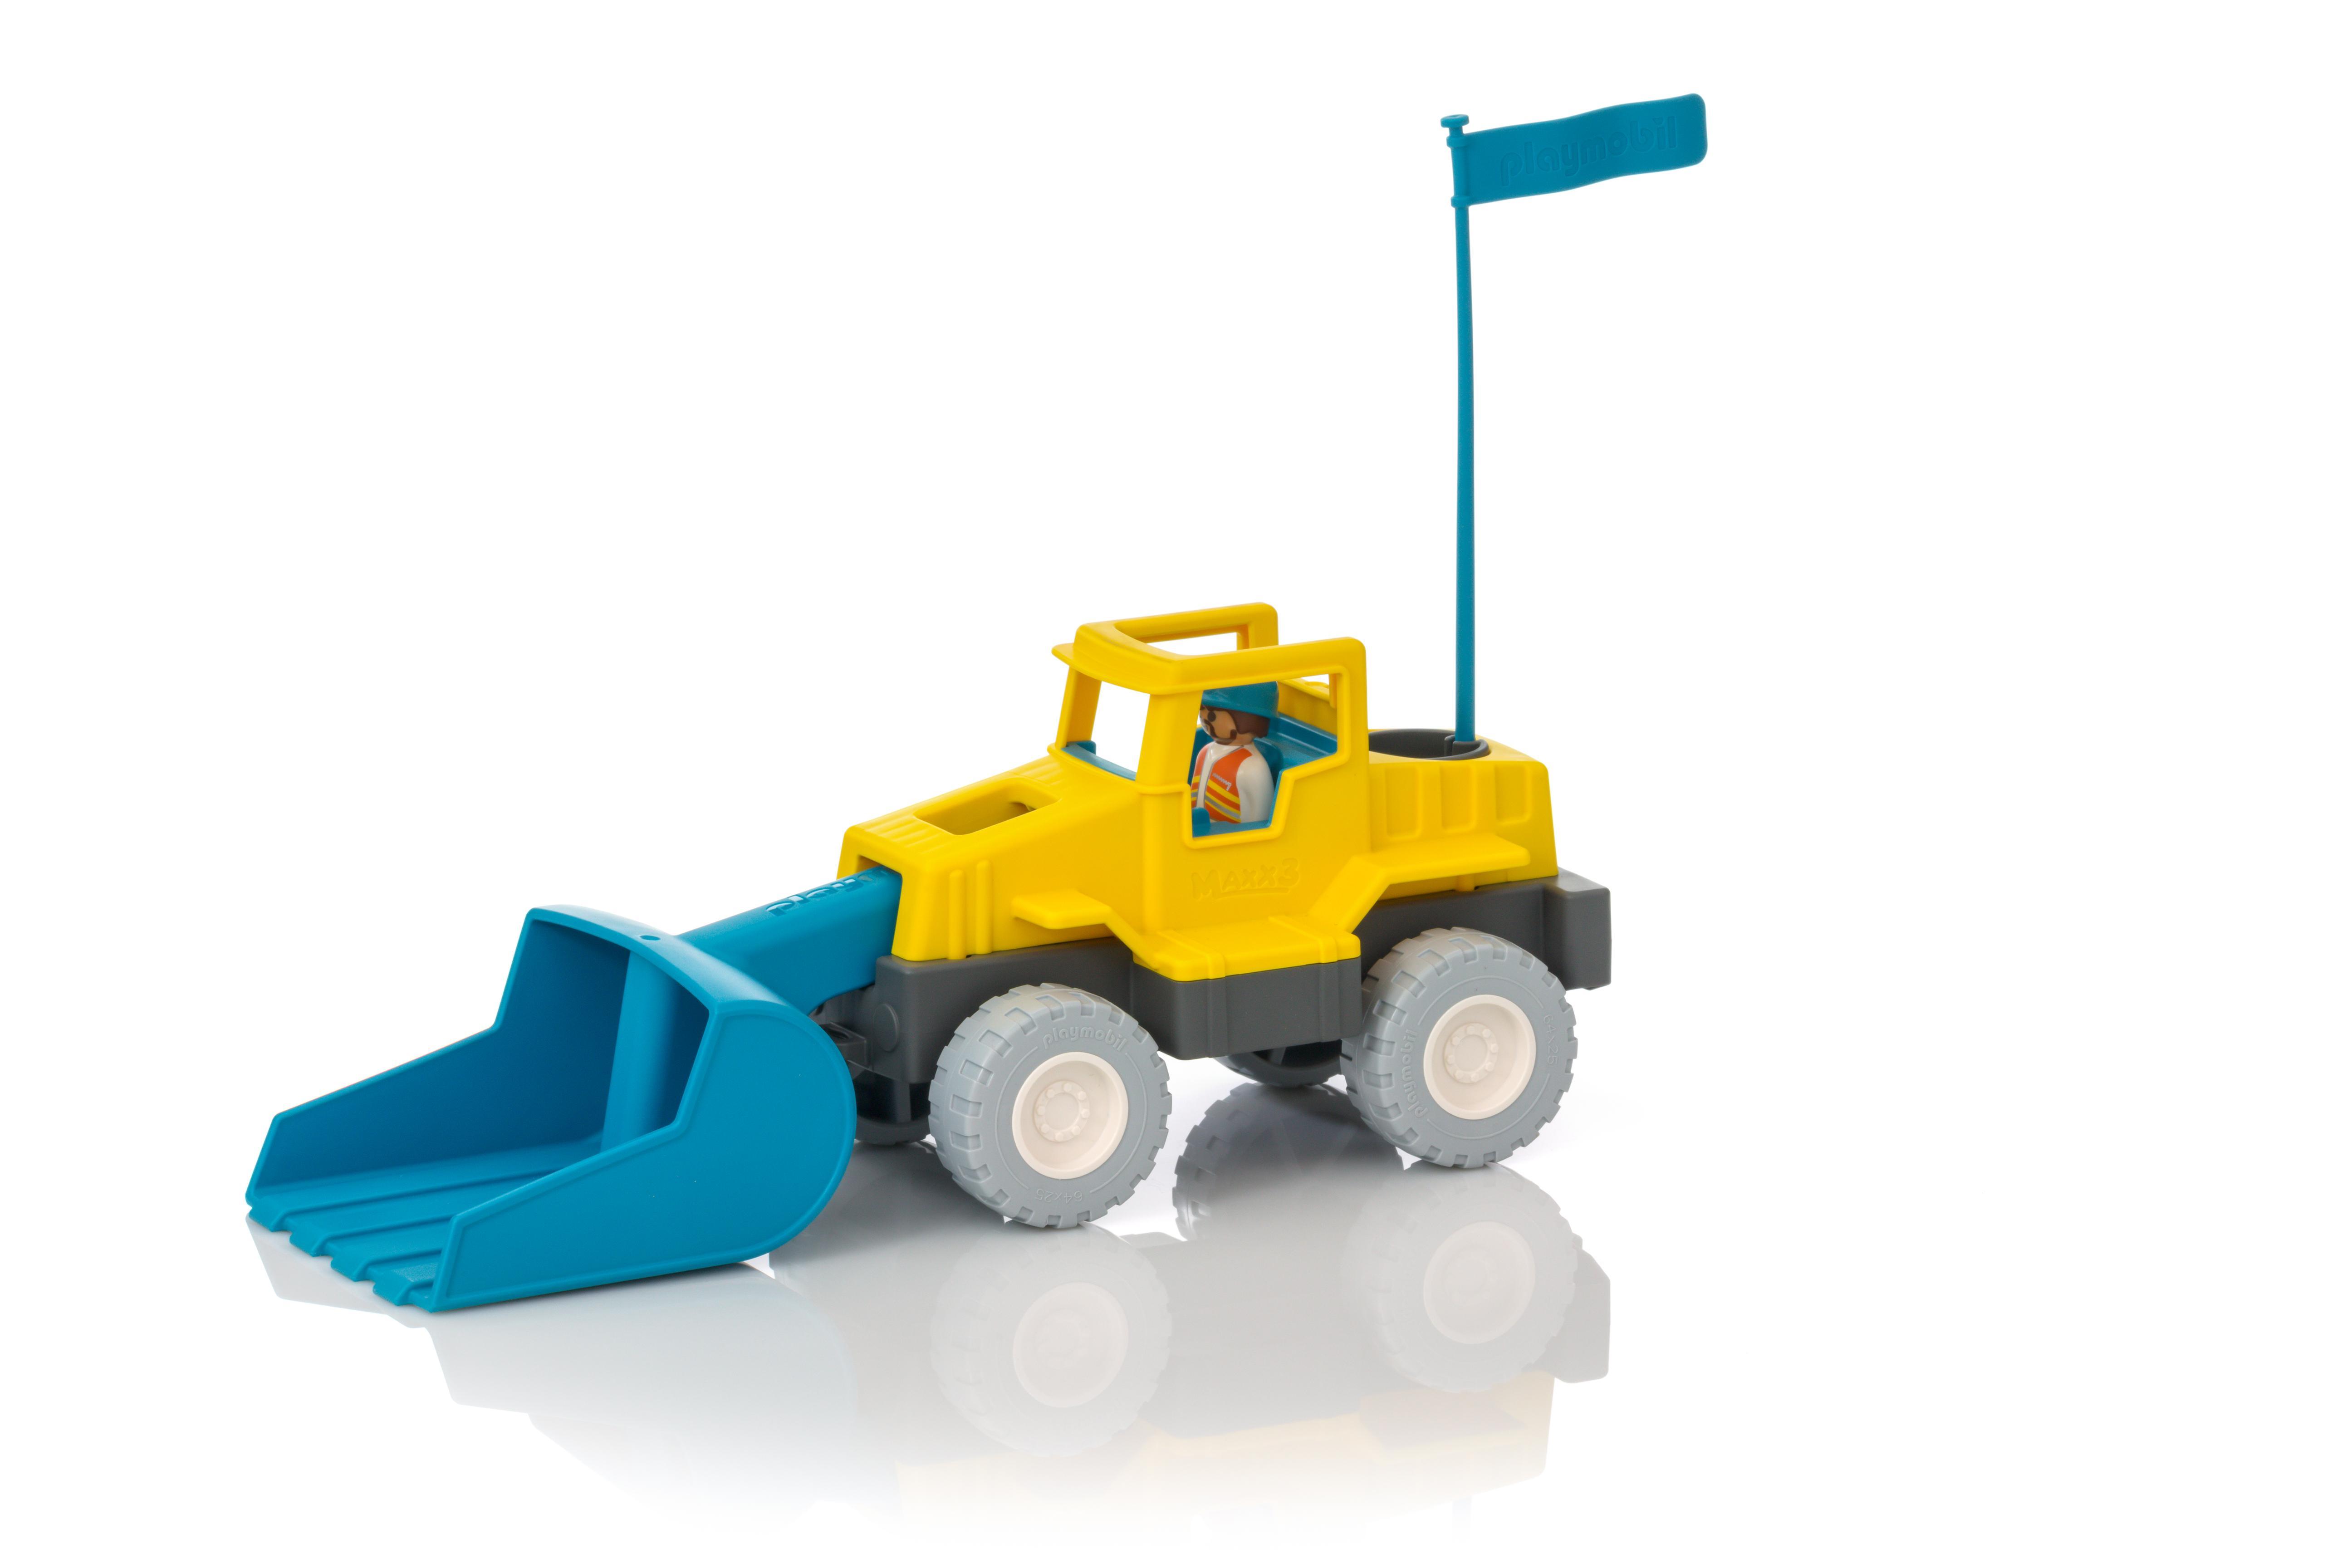 Gr Vskopa 9145 Playmobil Nordeuropa Danmark # Uppleva Dimension